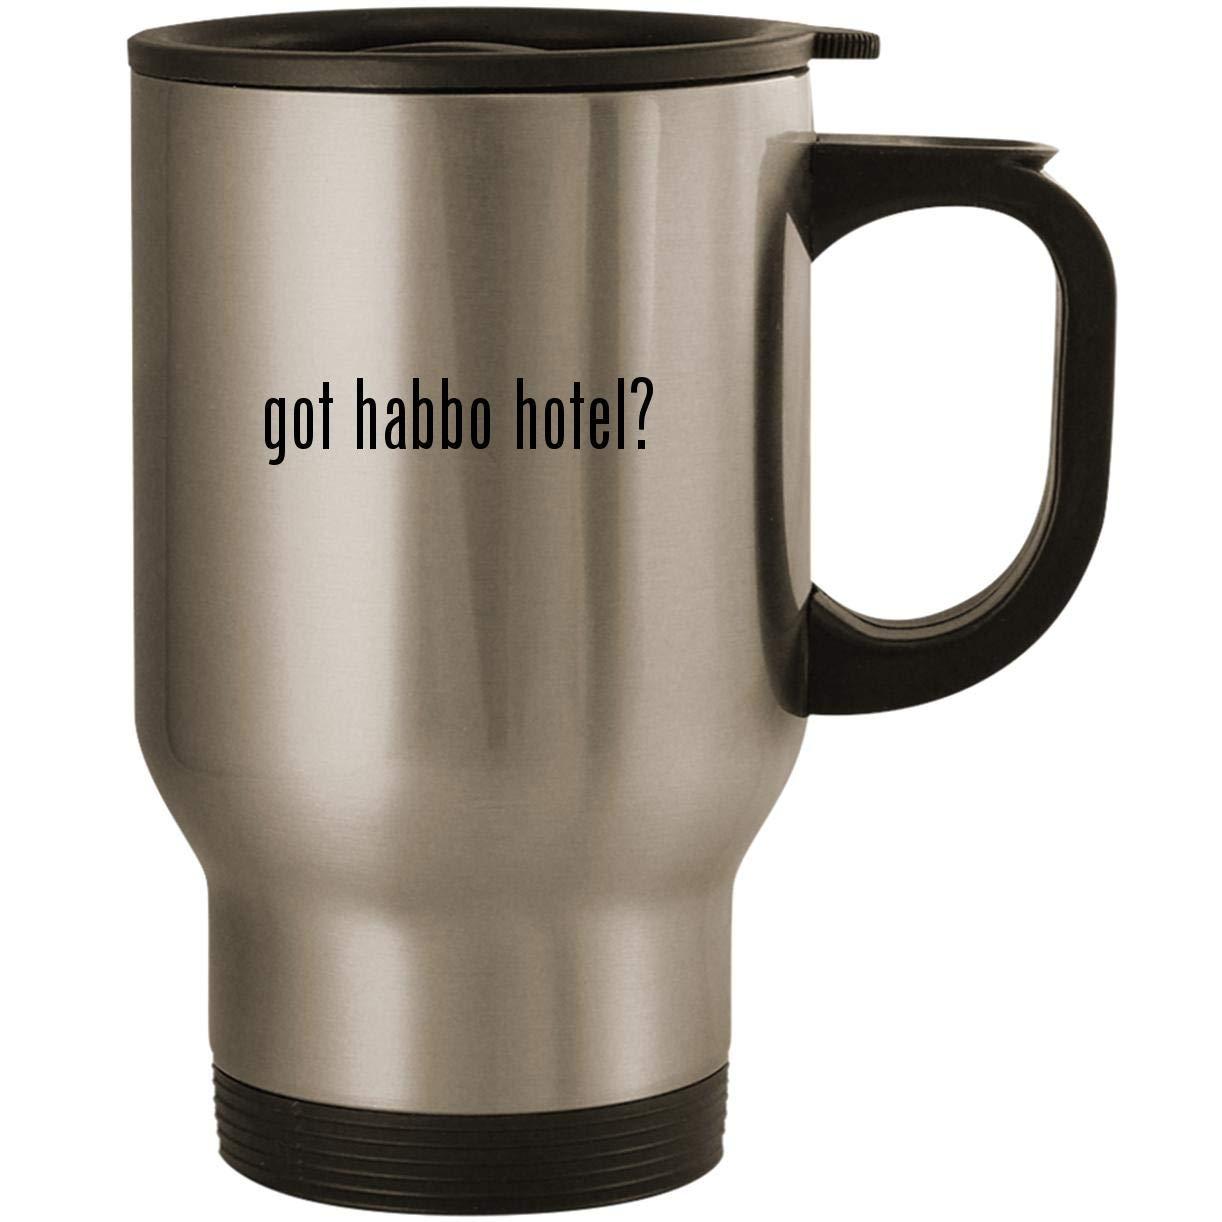 got habbo hotel? - Stainless Steel 14oz Road Ready Travel Mug, Silver